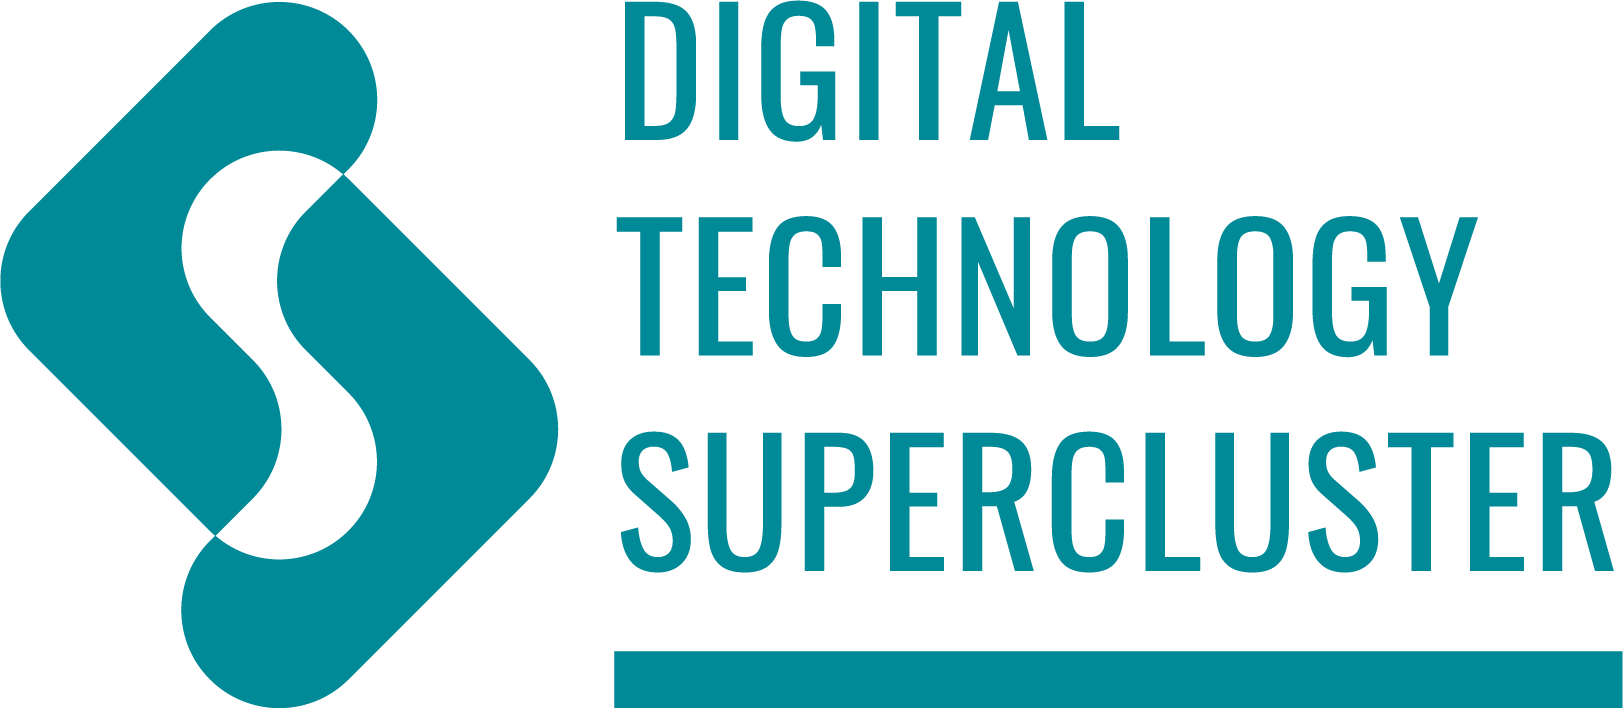 Digital Technology Supercluster logo